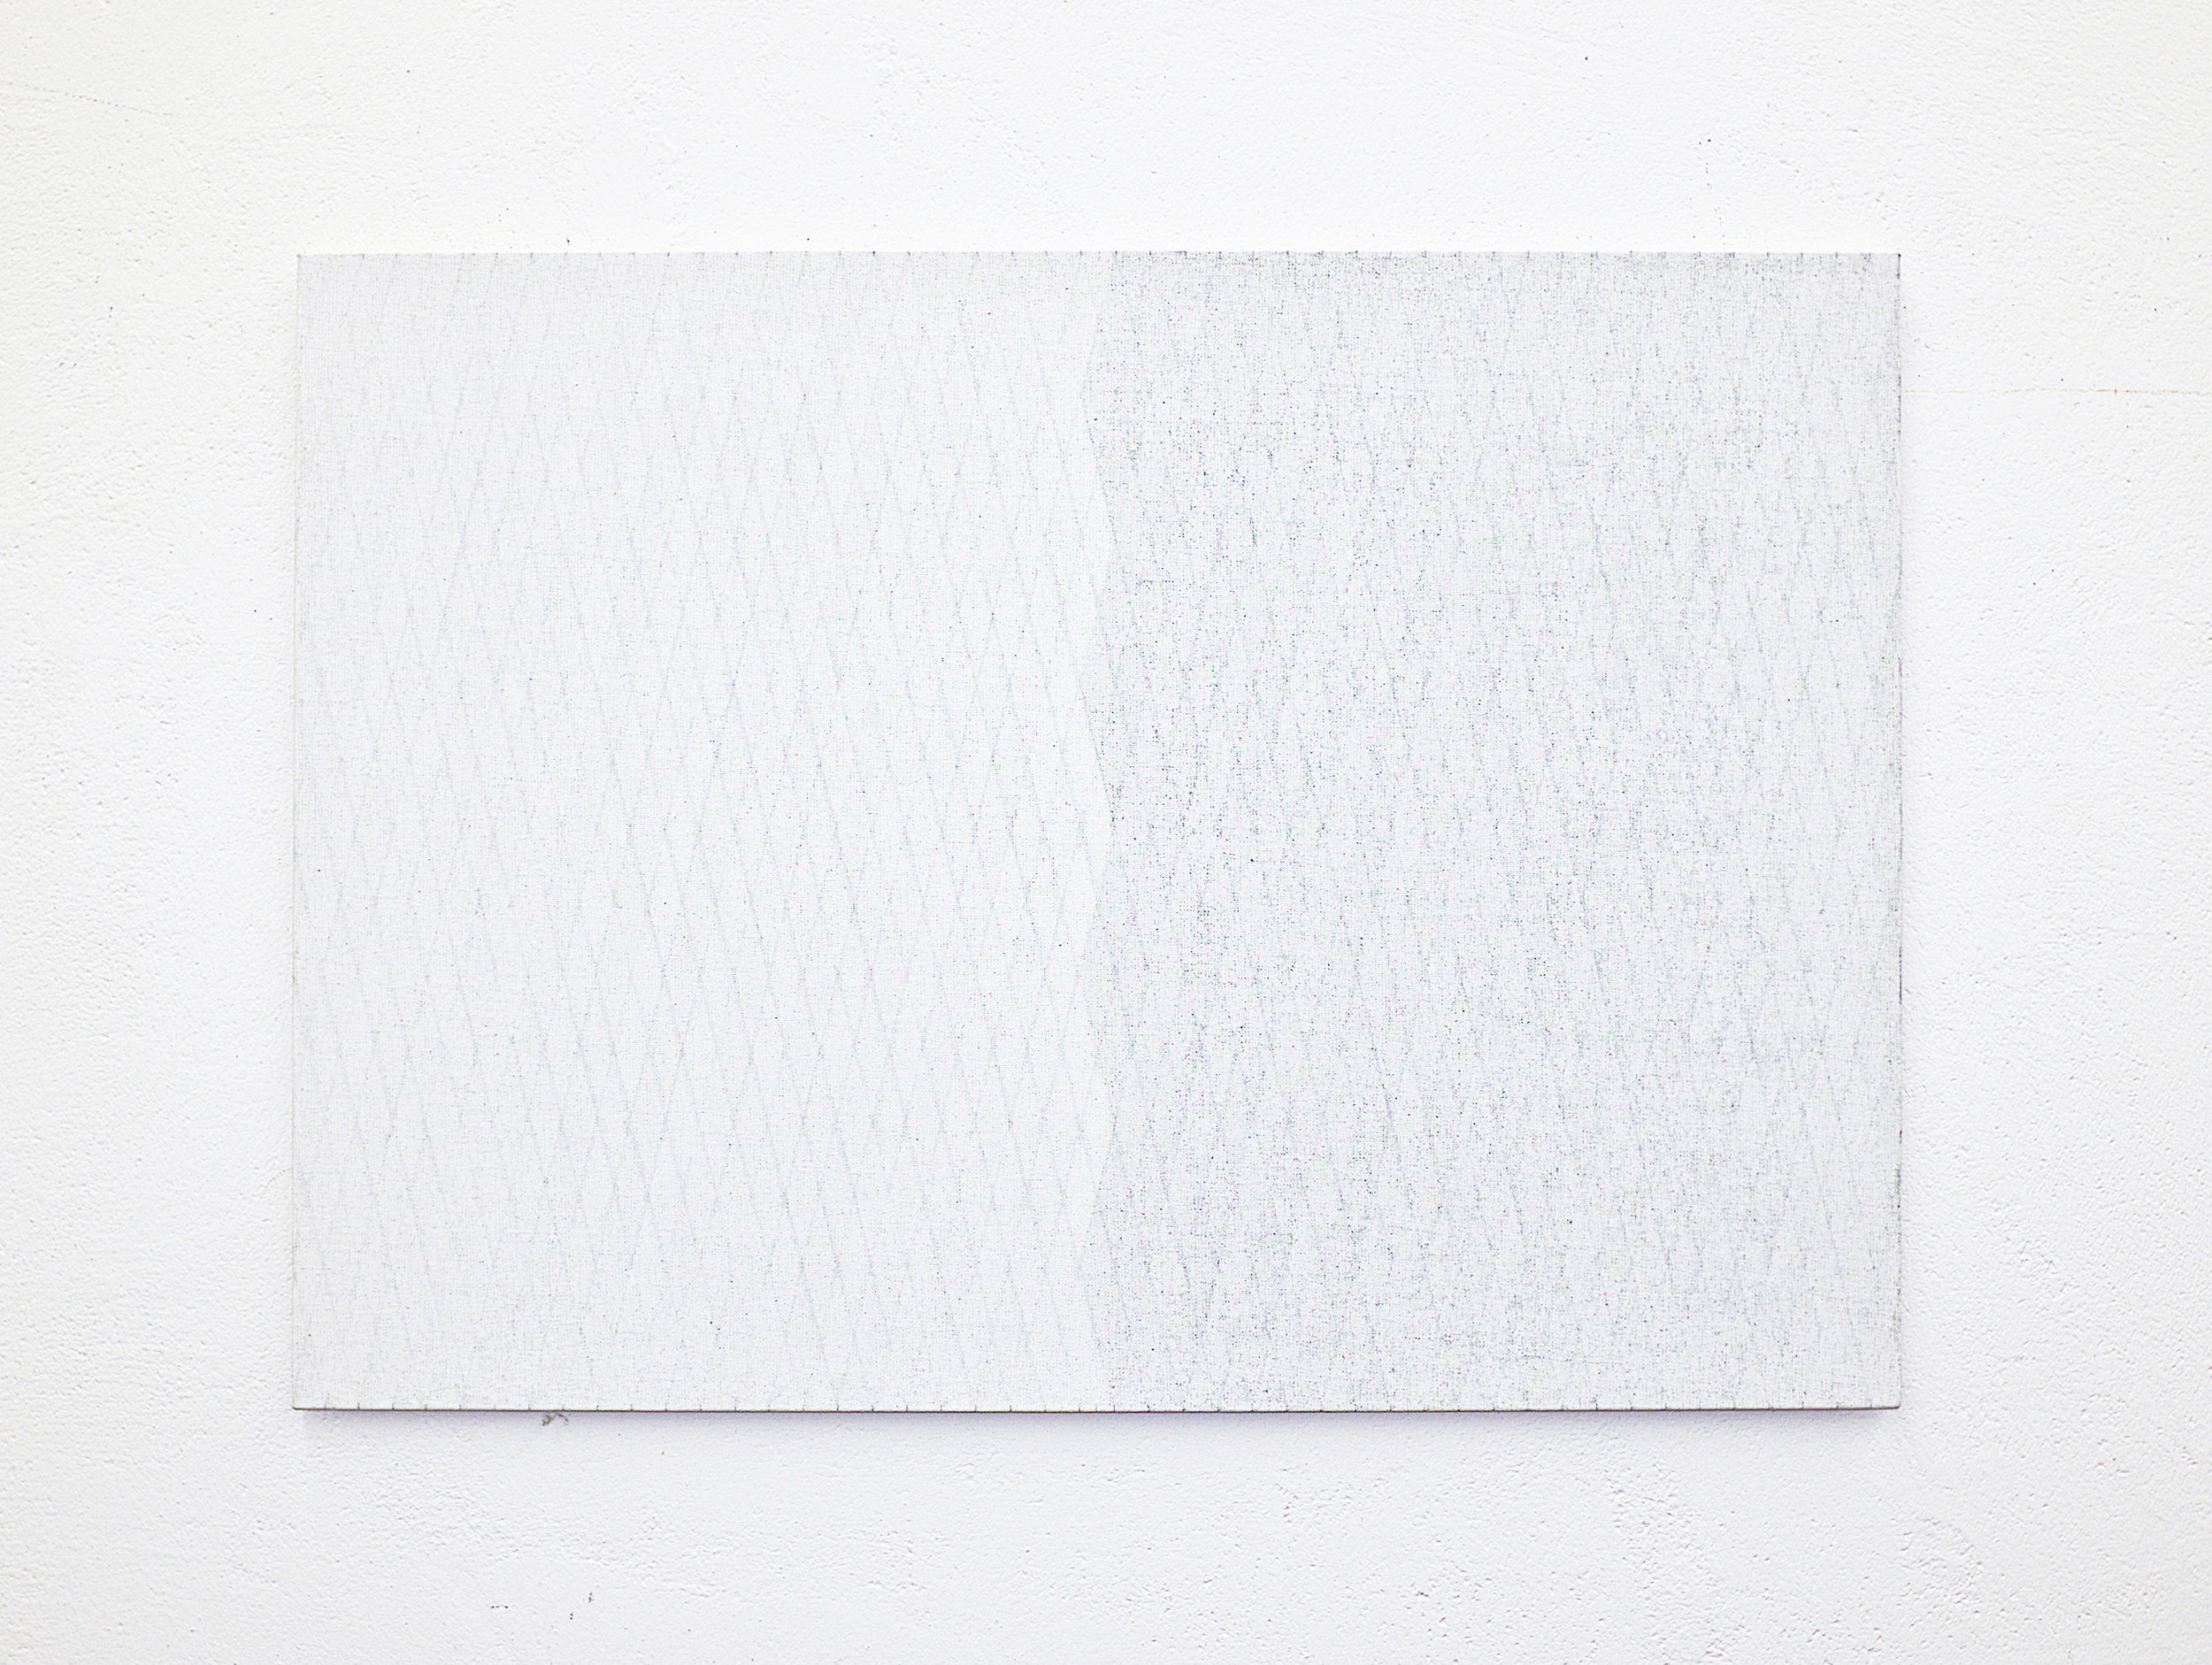 bild nr. 01/2016 - 50 x 70cm - acryl auf baumwolle/alu